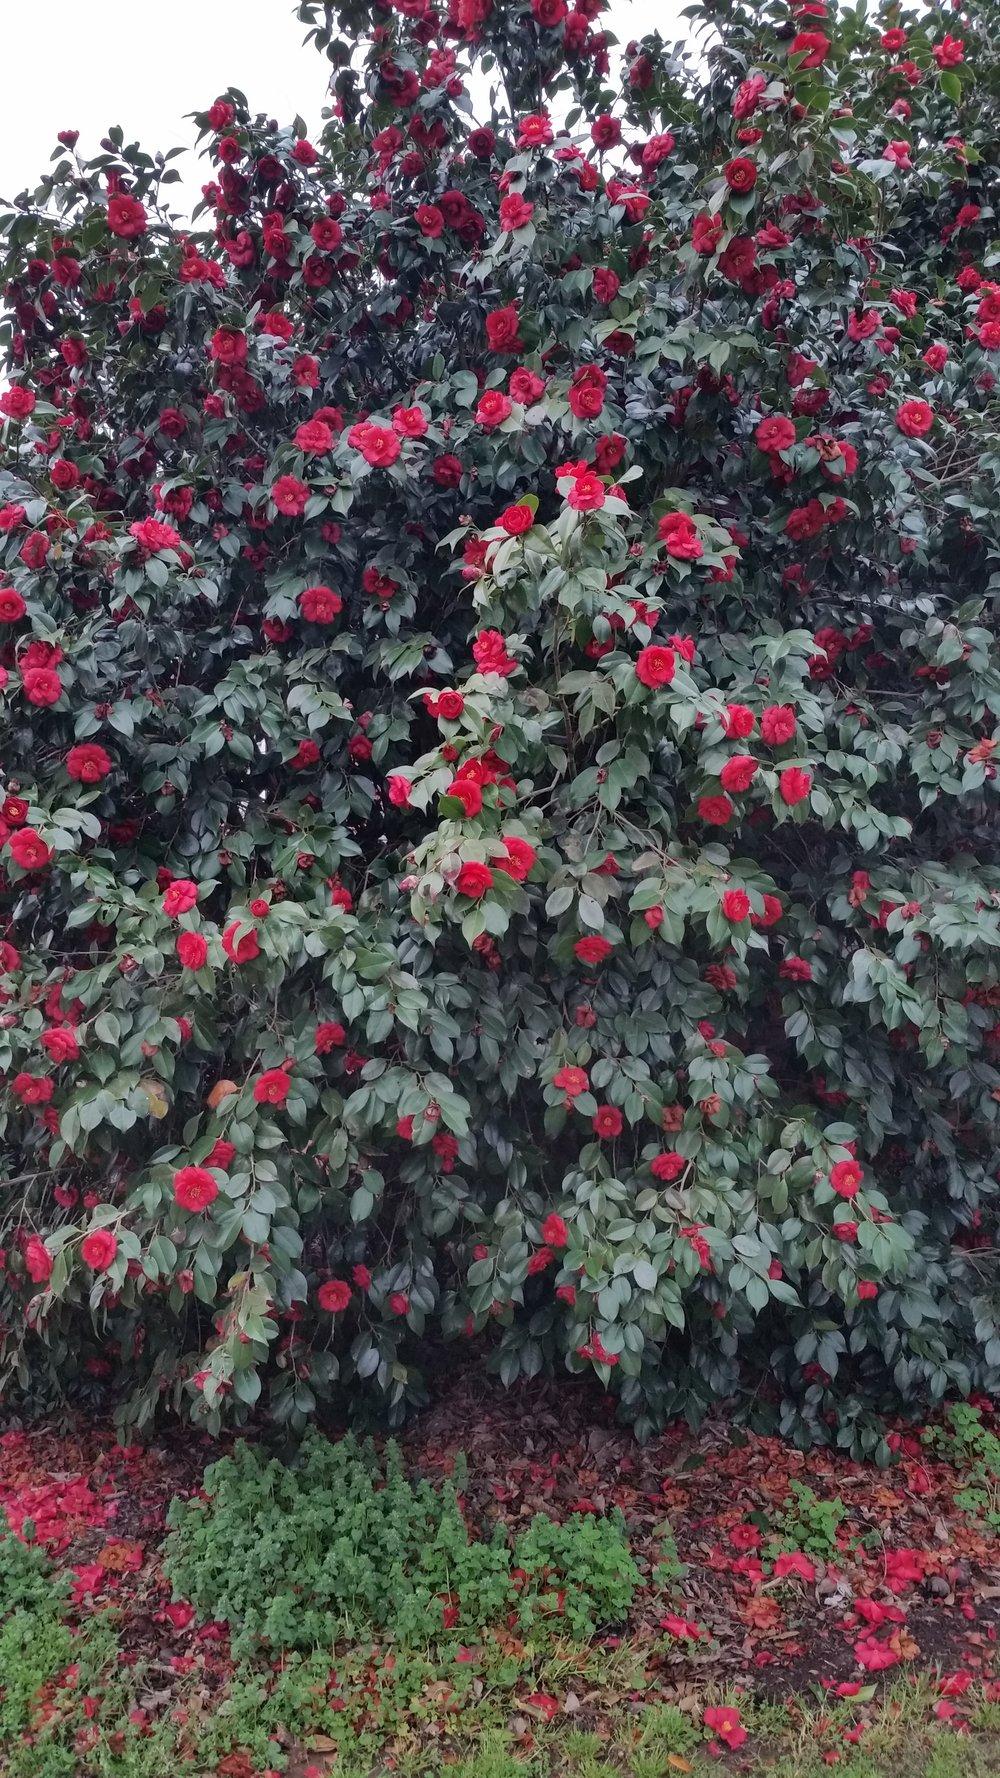 A fully loaded shrub in the Snoddy garden